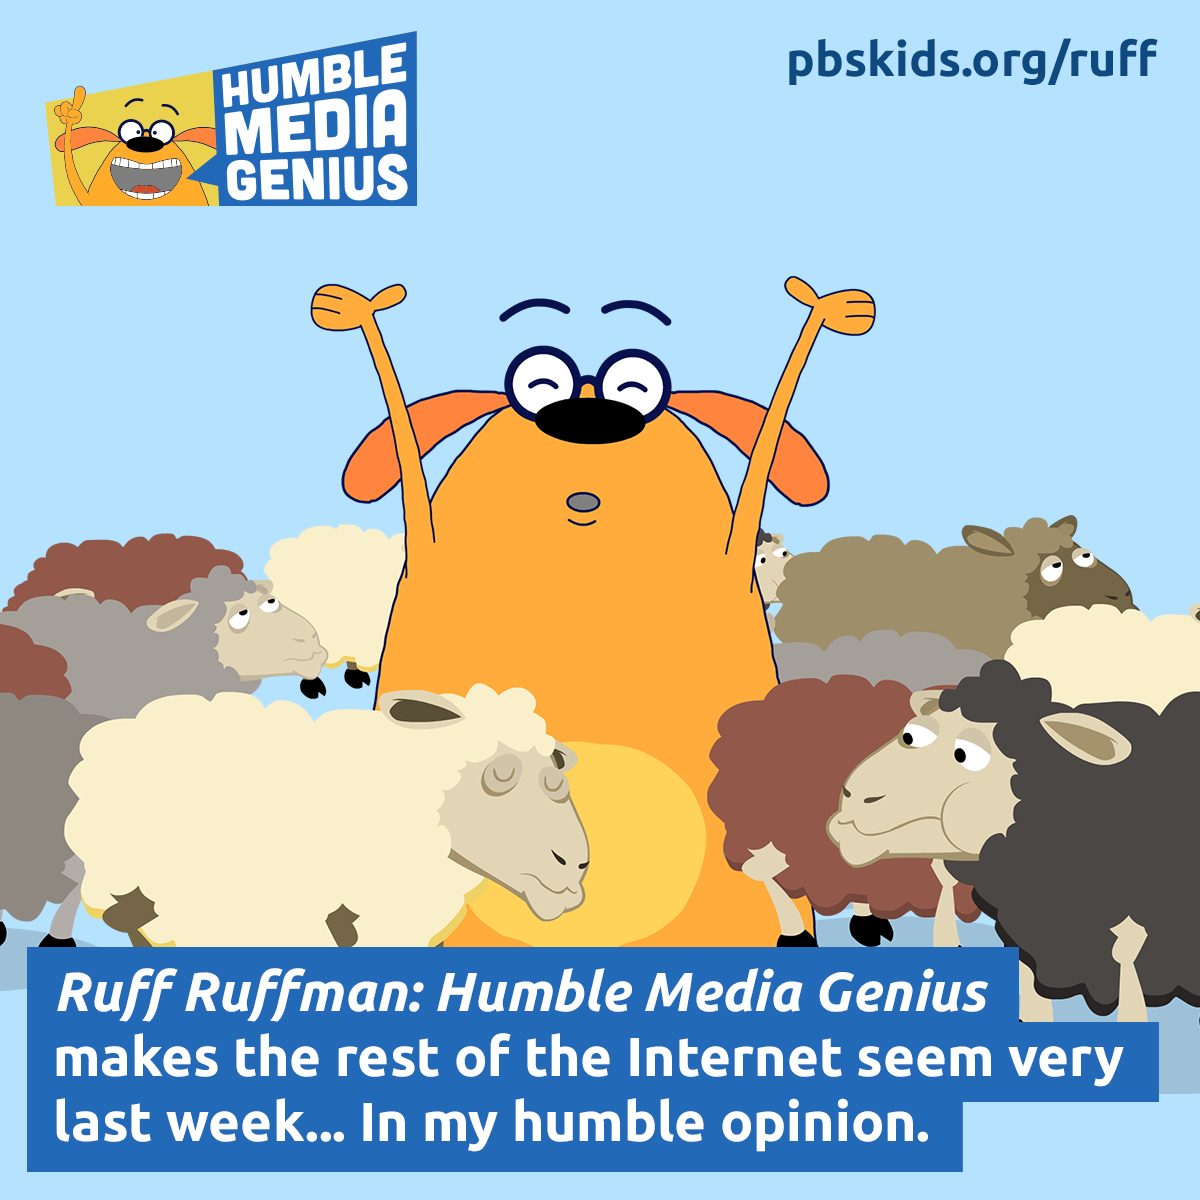 Ruff Ruffman: Humble Media Genius is a new site at PBS KIDS